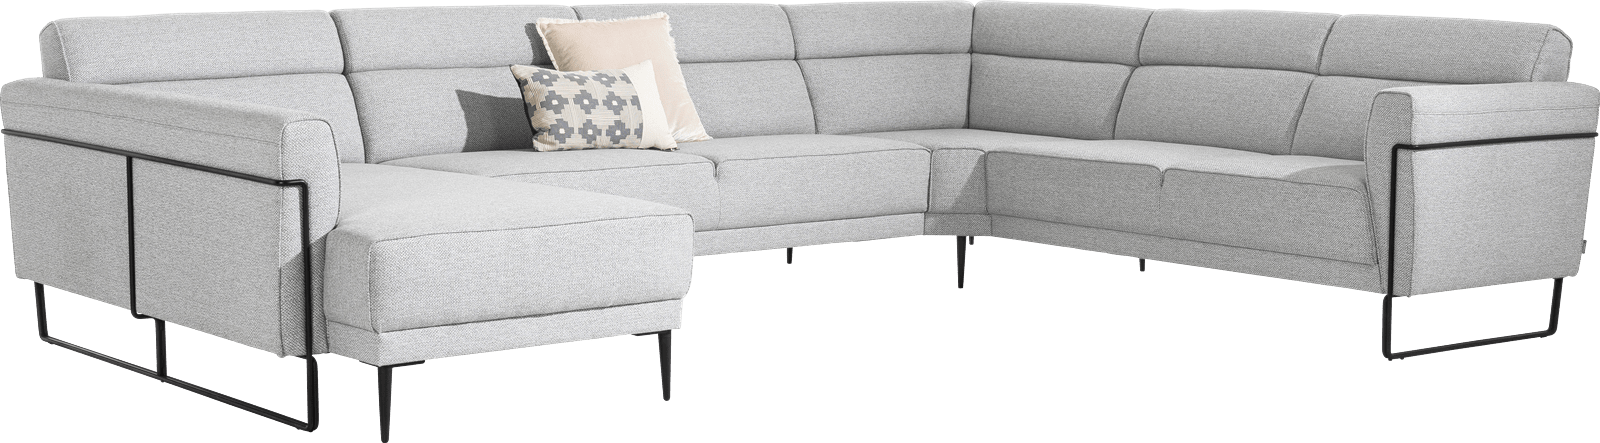 XOOON - Fiskardo - Skandinavisches Design - Sofas - eckteil